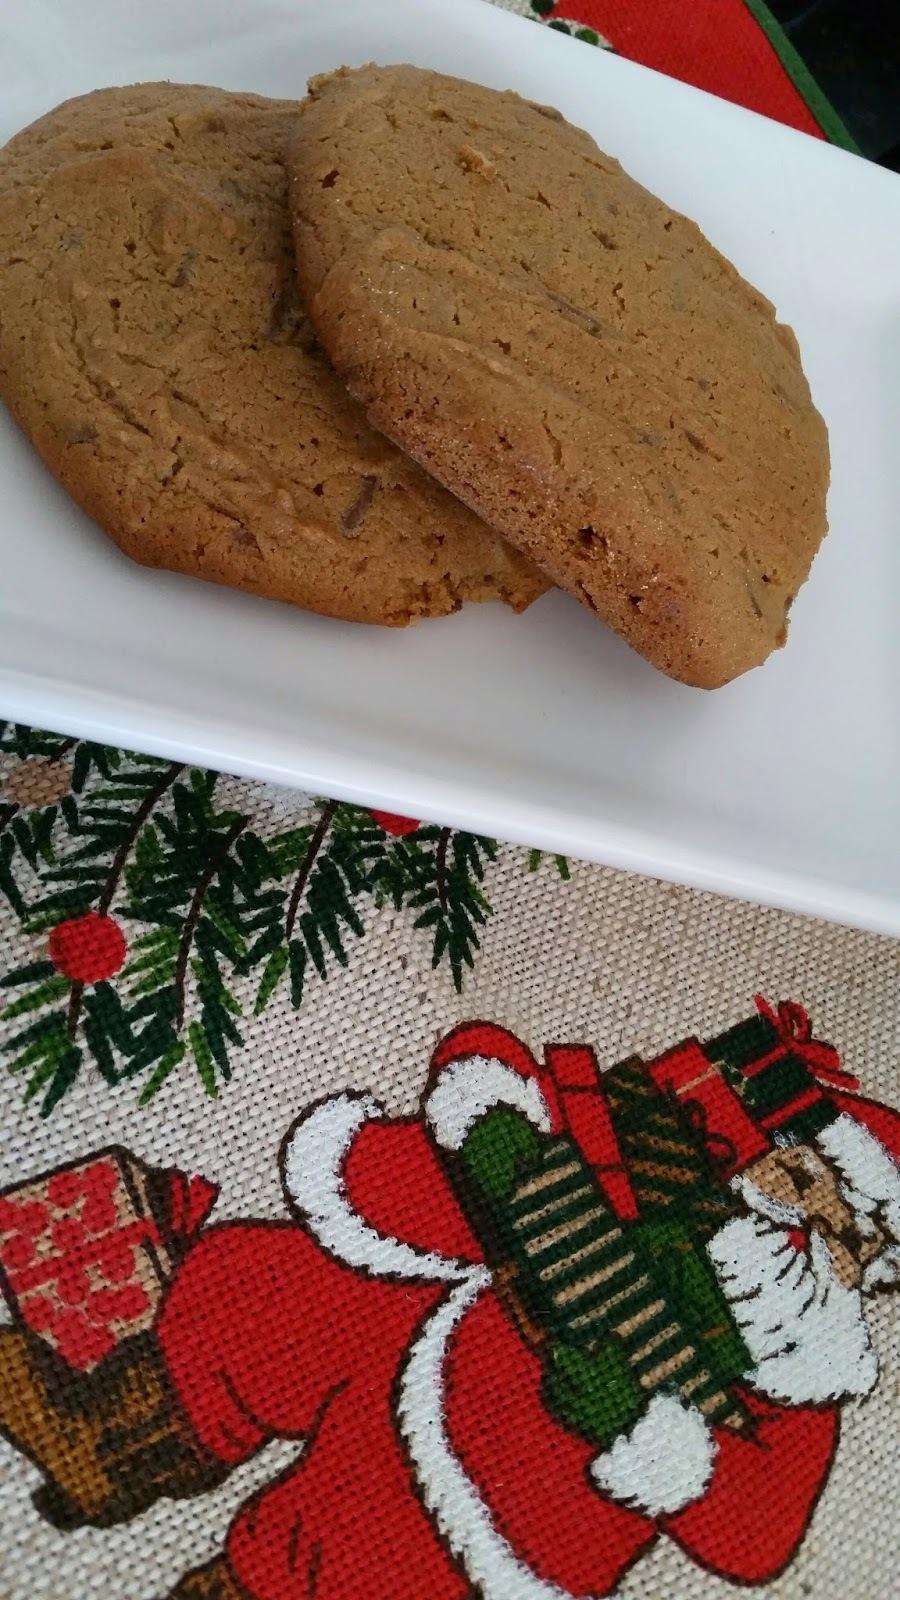 Cookies de Doce de Leite e Amendoim